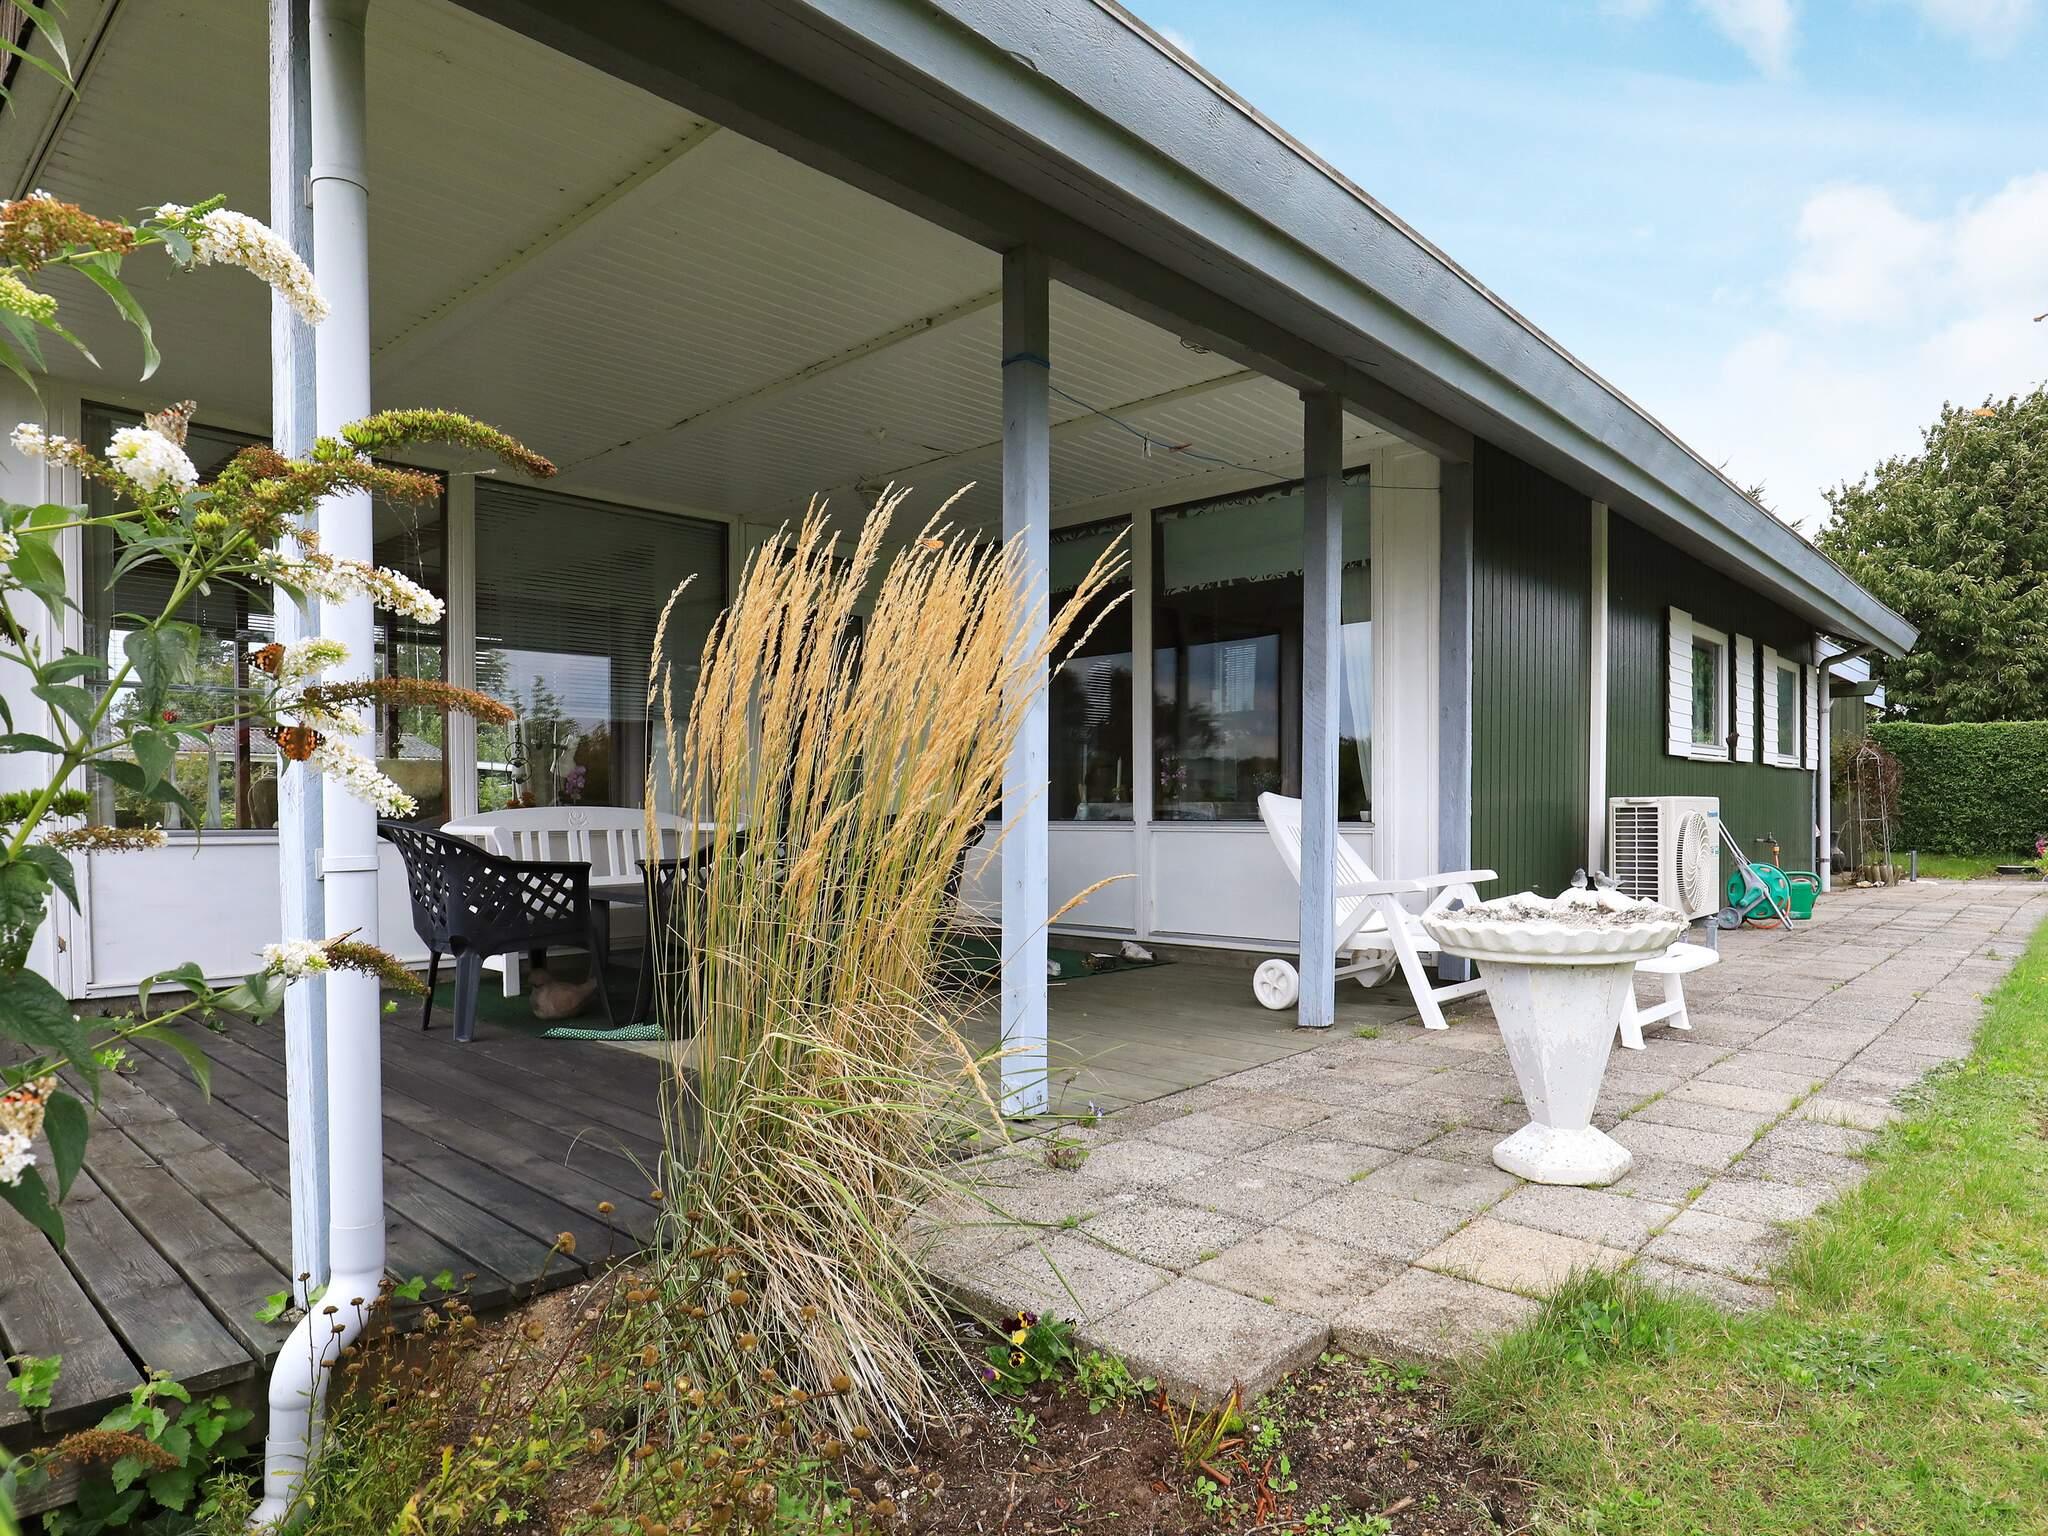 Maison de vacances Eskov Strandpark (610274), Roslev, , Limfjord, Danemark, image 16